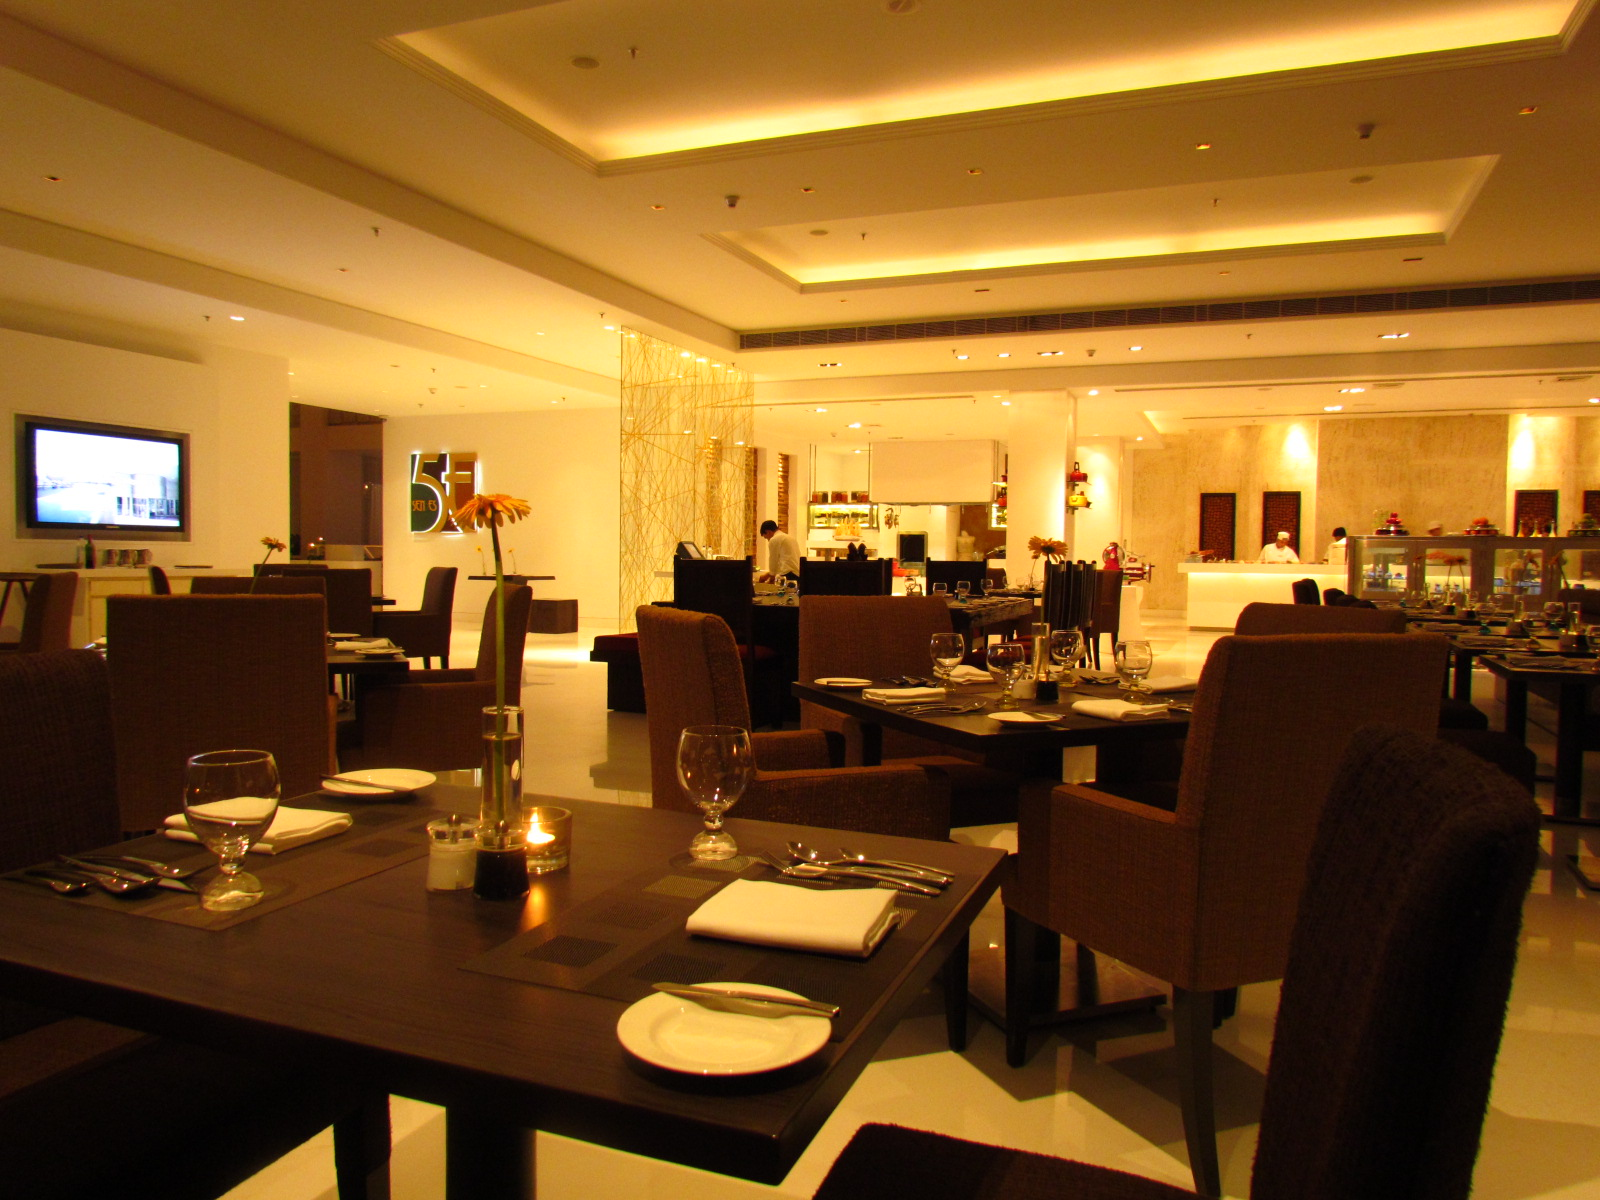 Sen5es pullman hotel gurgaon yummraj for Pullman hotel